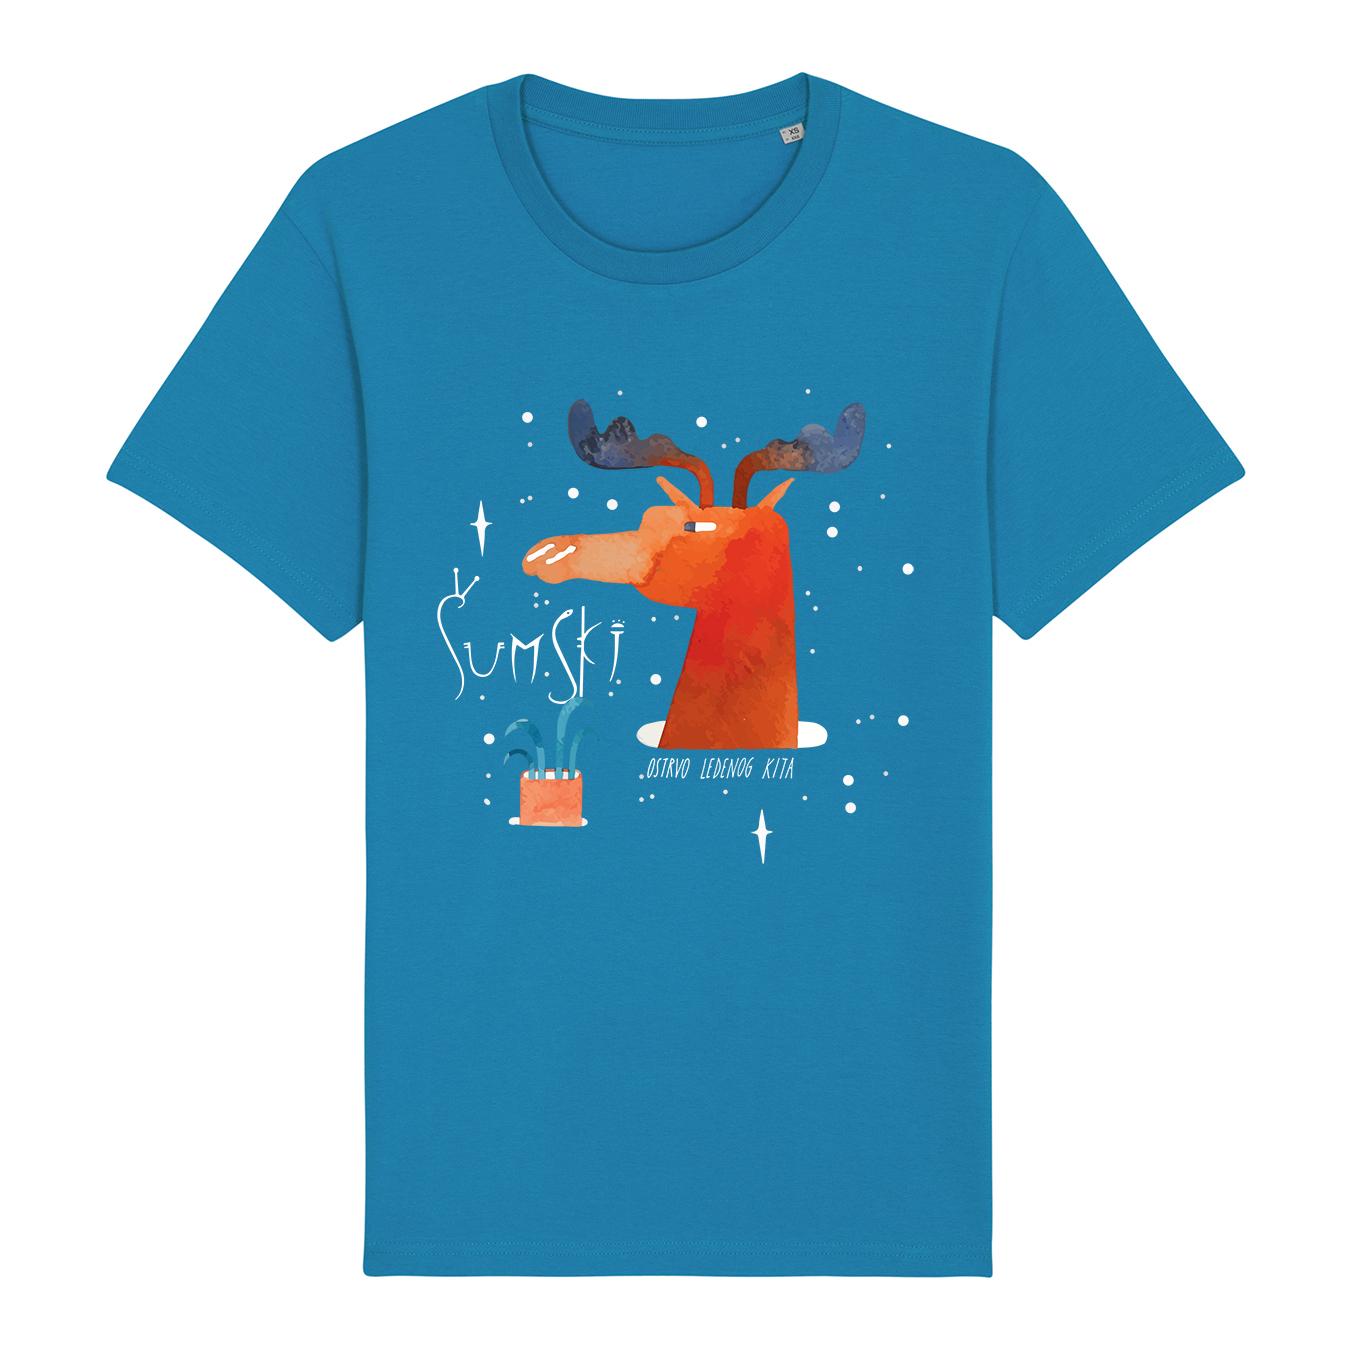 ŠUMSKI - Ostrvo ledenog kita - T-Shirt